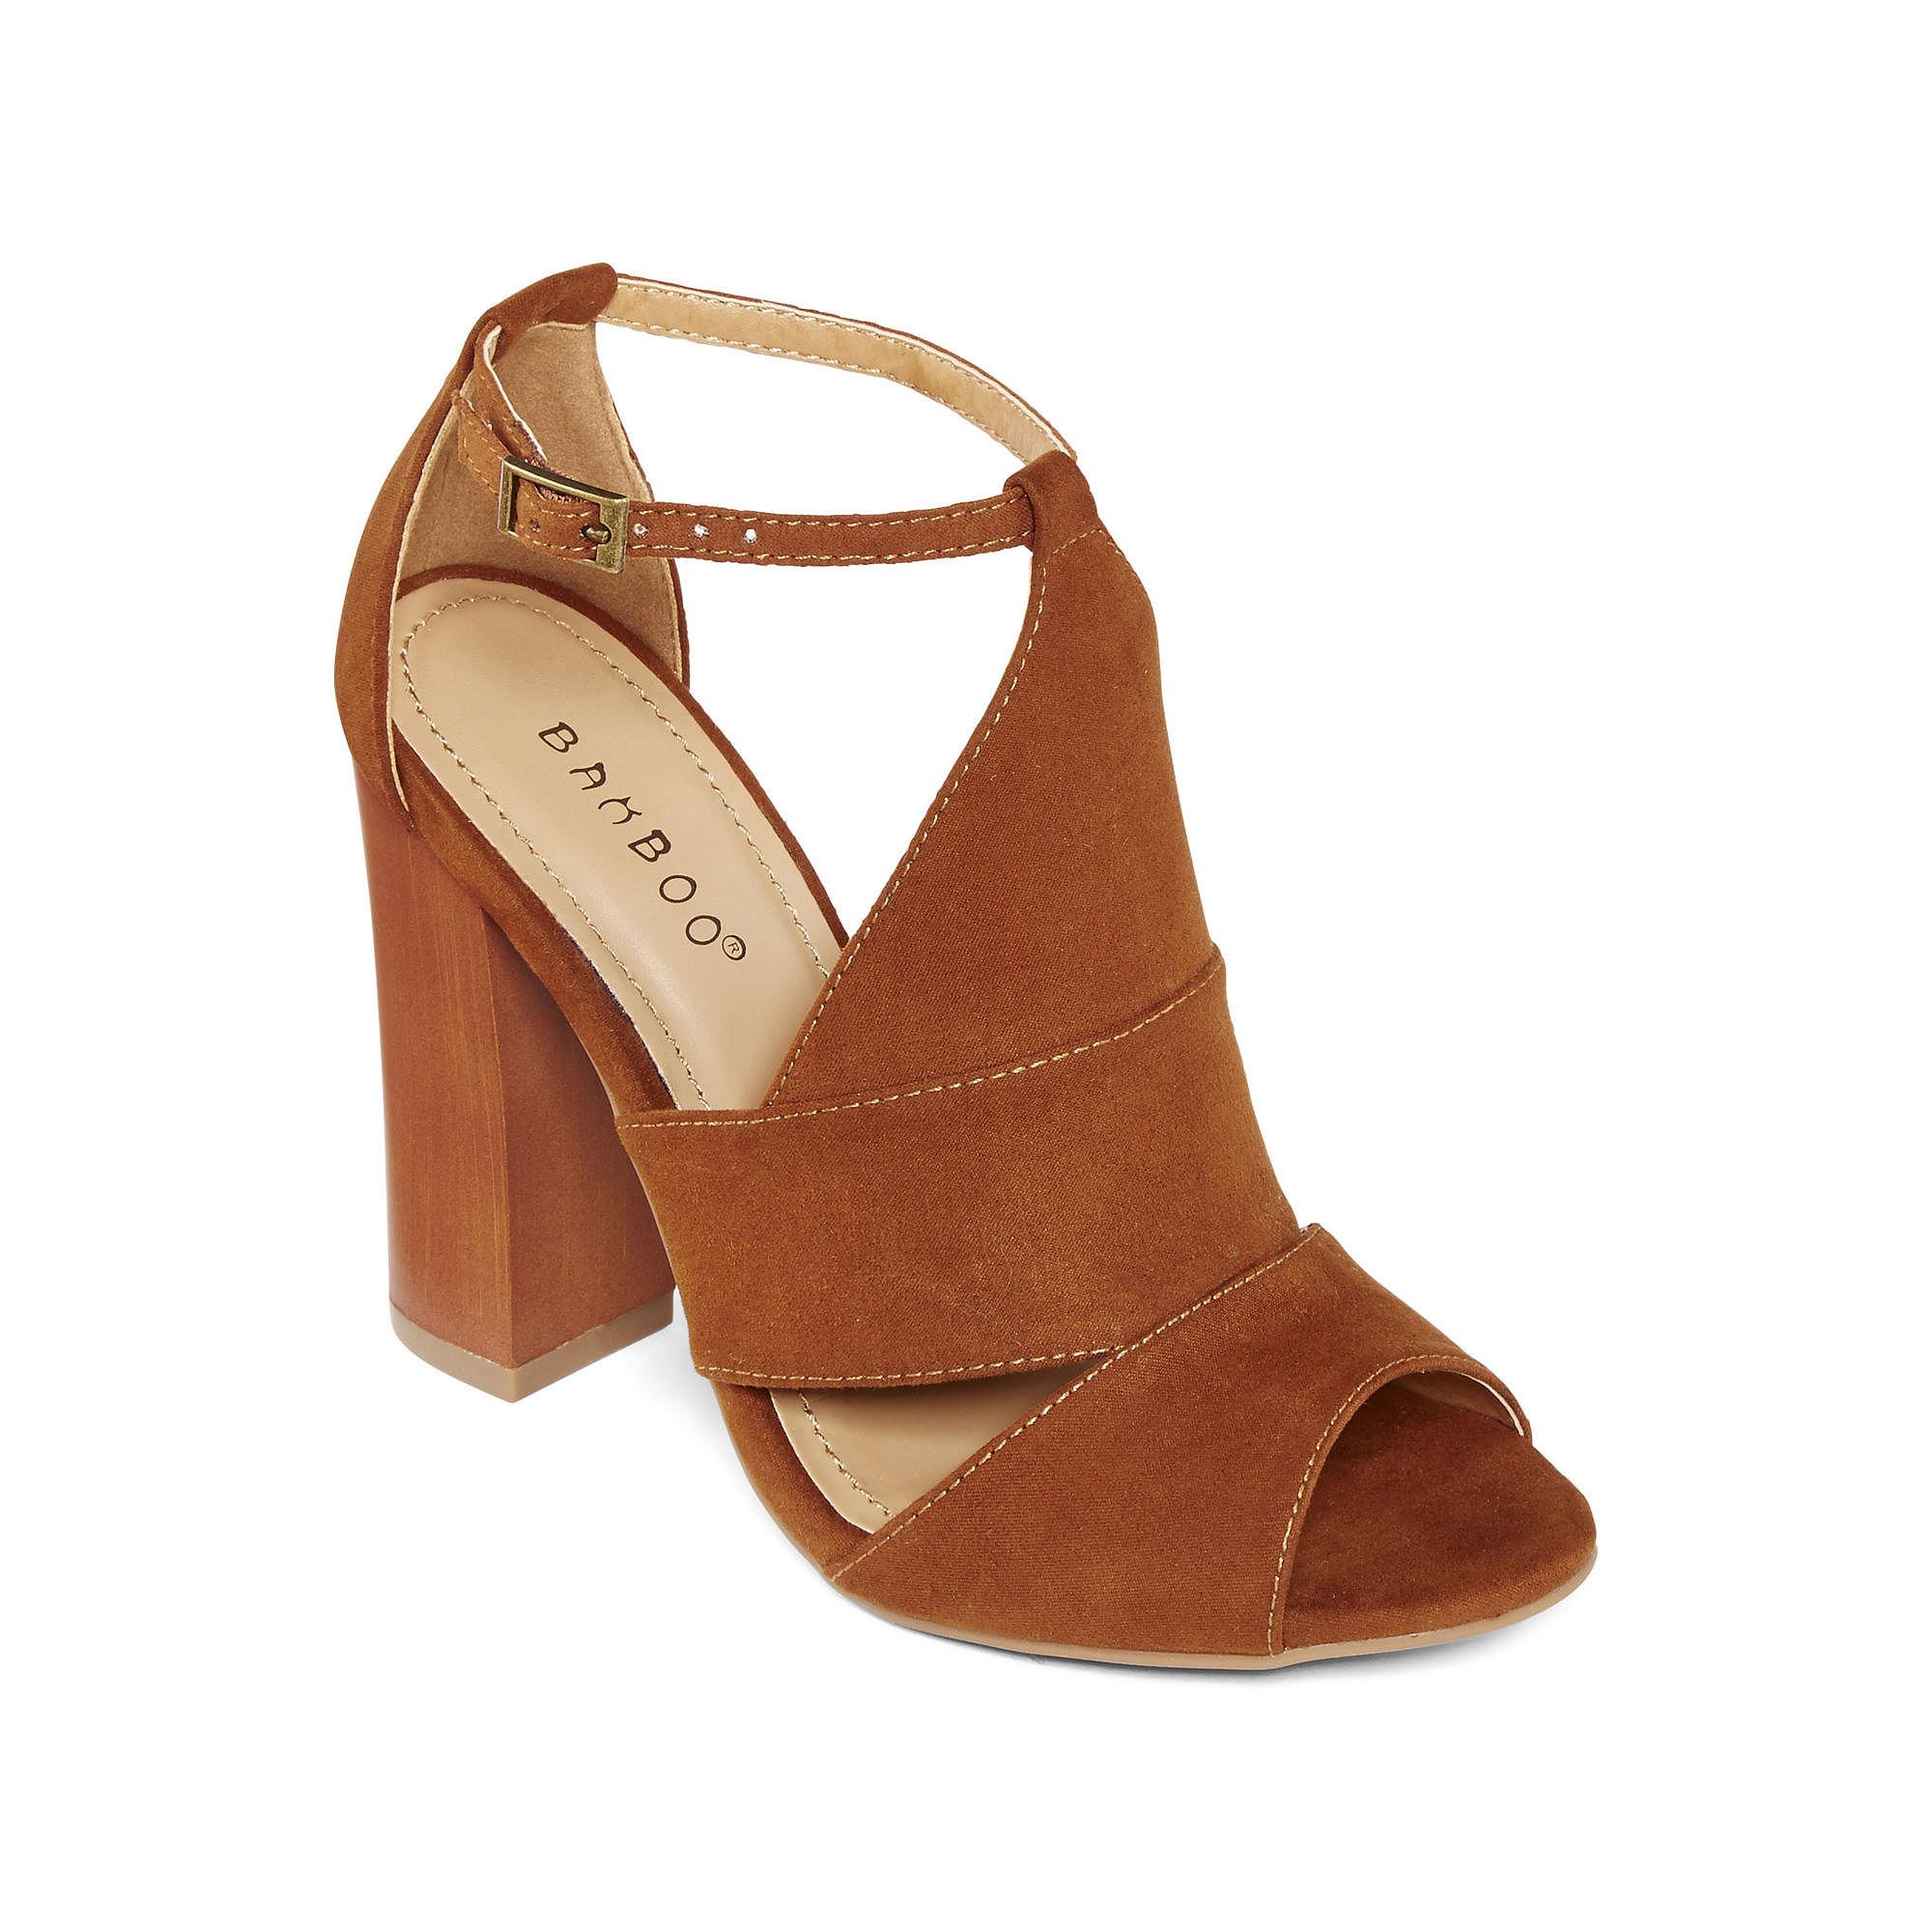 e2b587d9e9 Bamboo Embark Chunky Heel Sandals. EAN-13 Barcode of UPC 768241198725.  768241198725